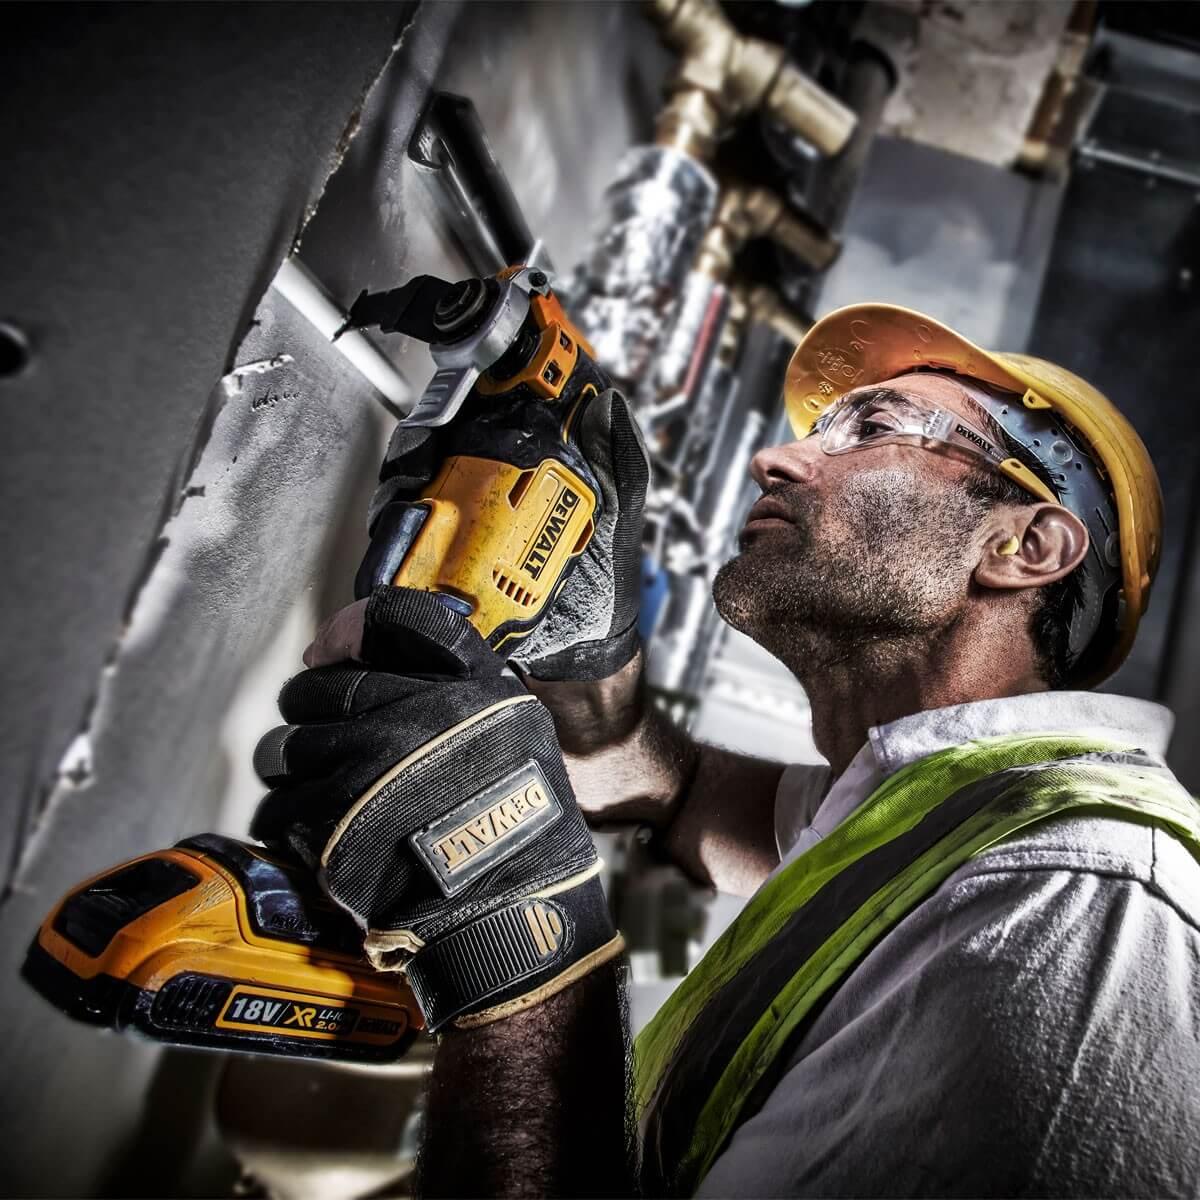 DCS355 Product Spotlight - Toolden